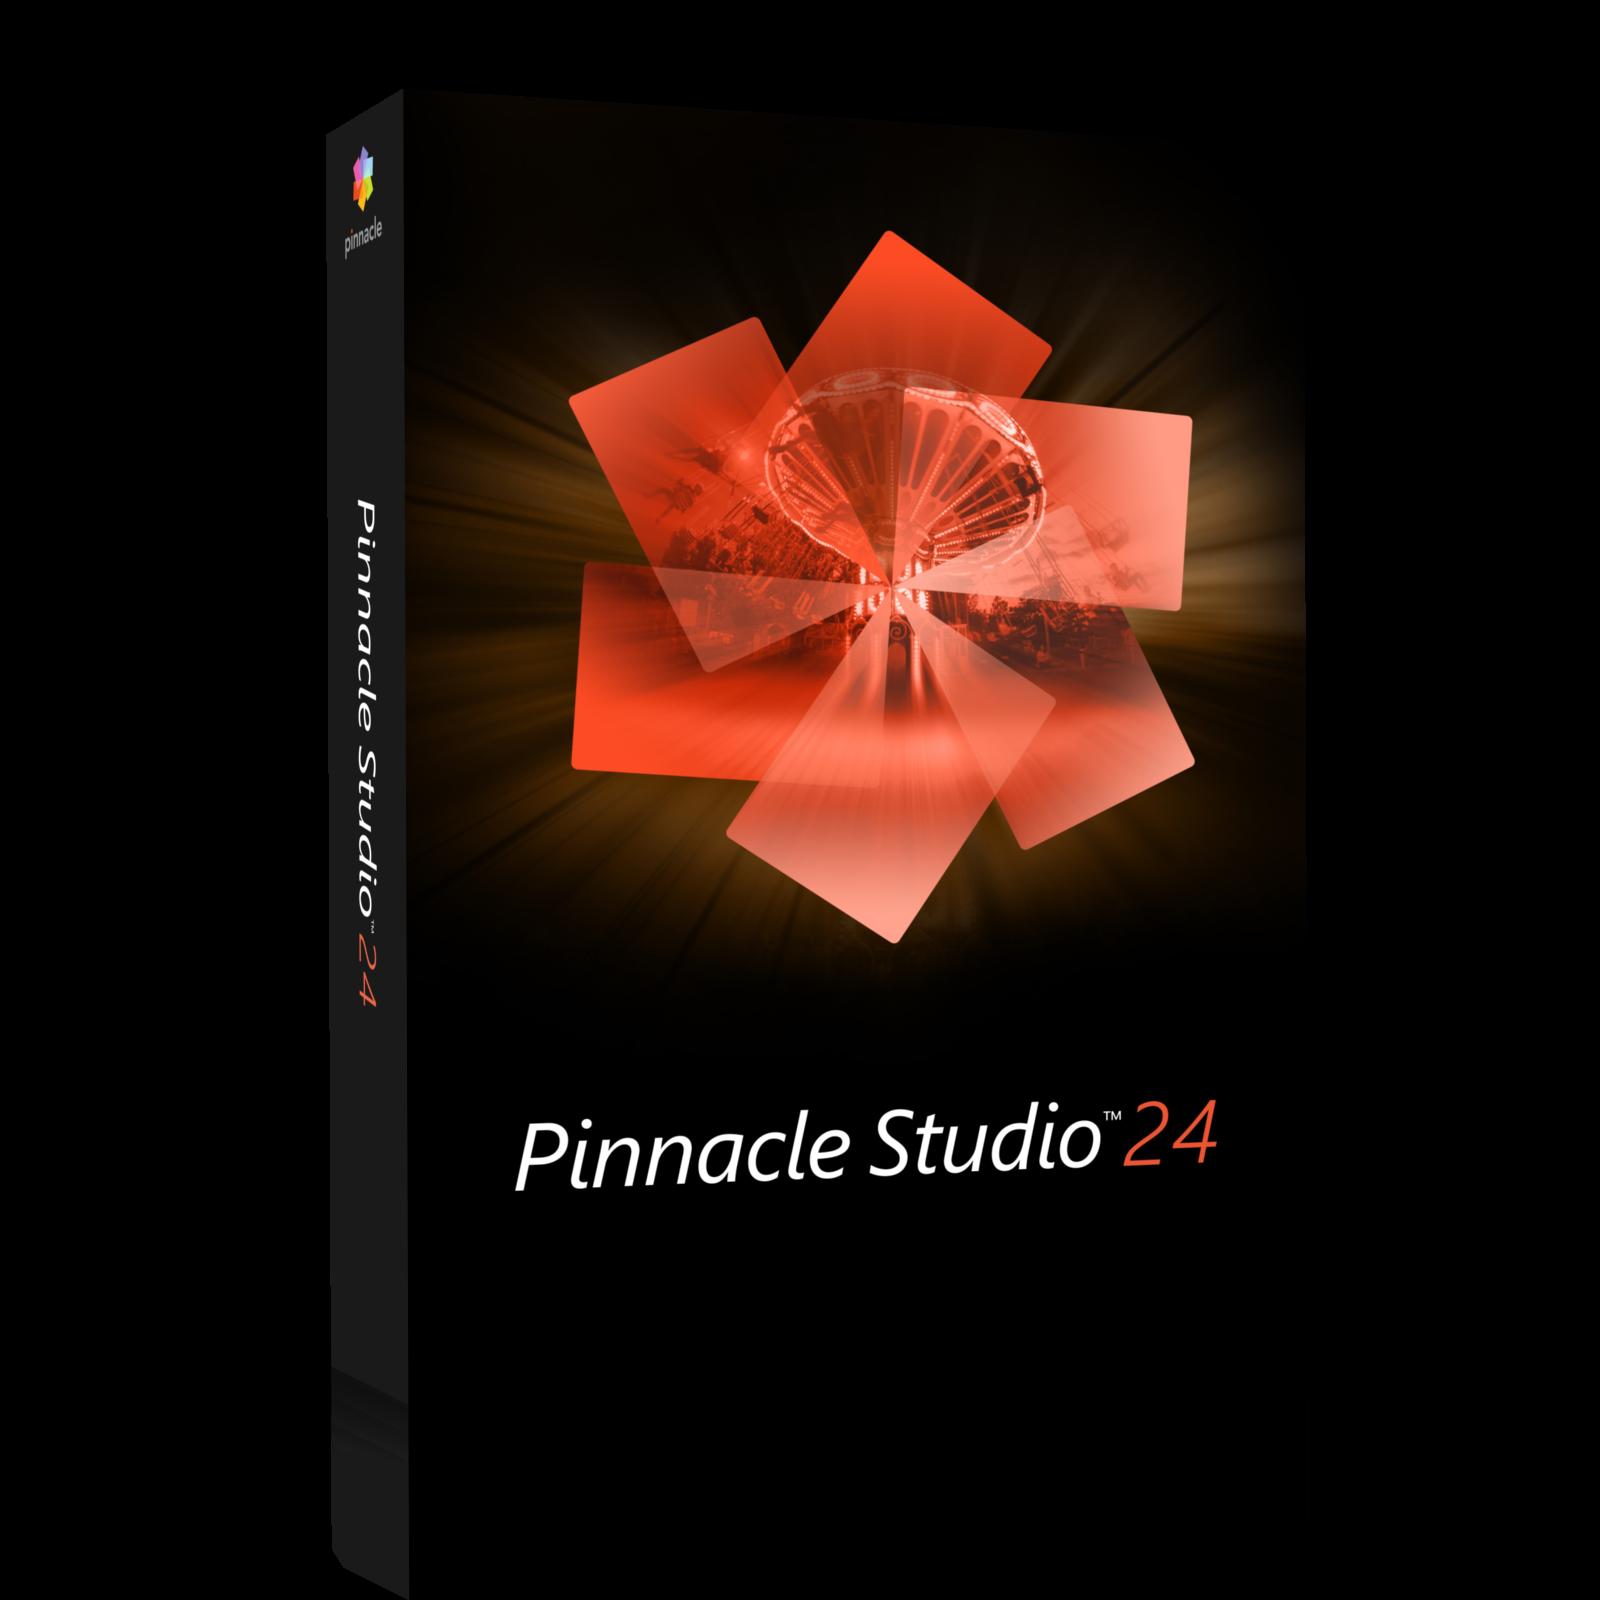 pinnacle-studio-24-std-rt-shadow-fade-ge